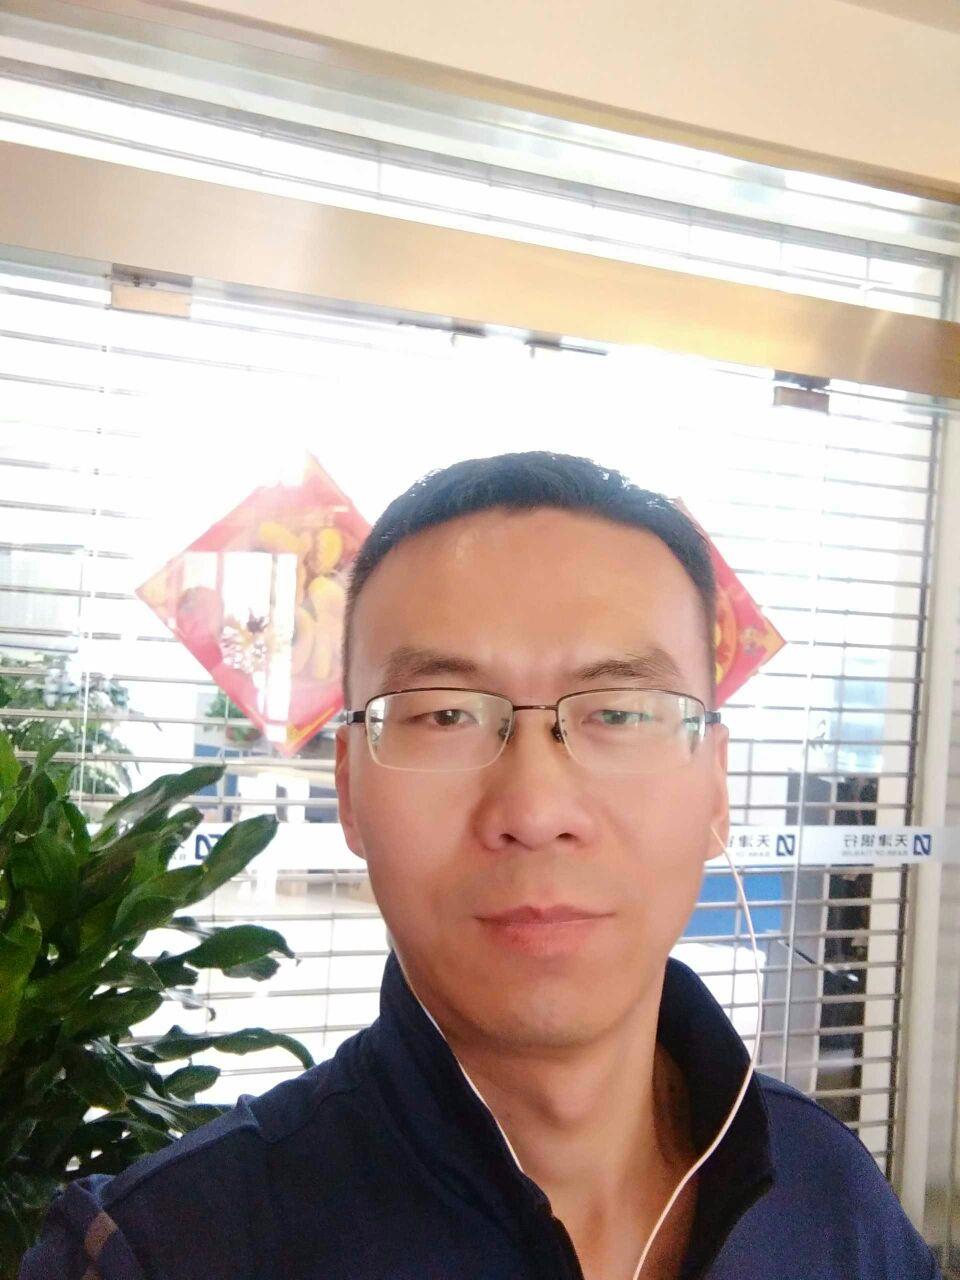 http://www.huodongxing.com/file/20170823/5432791921211/543290384061031.png